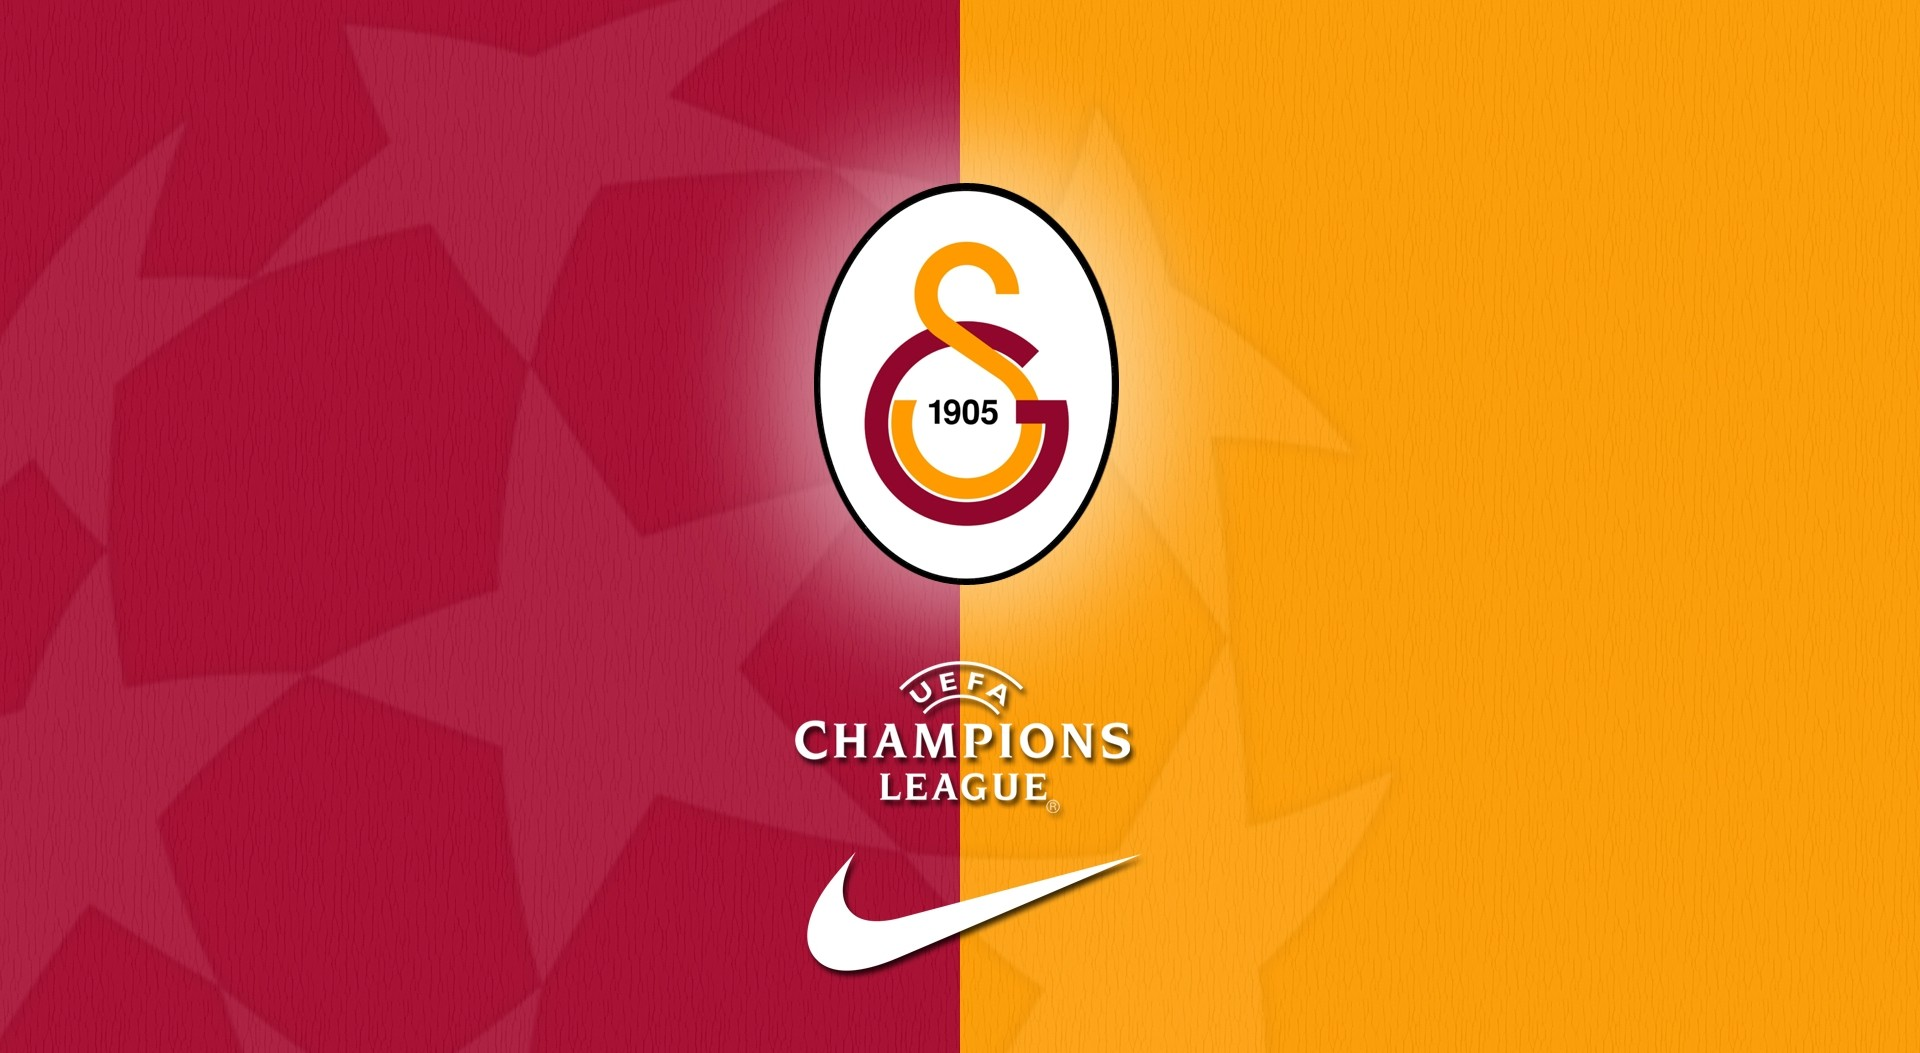 38 Galatasaray Wallpapers On Wallpapersafari